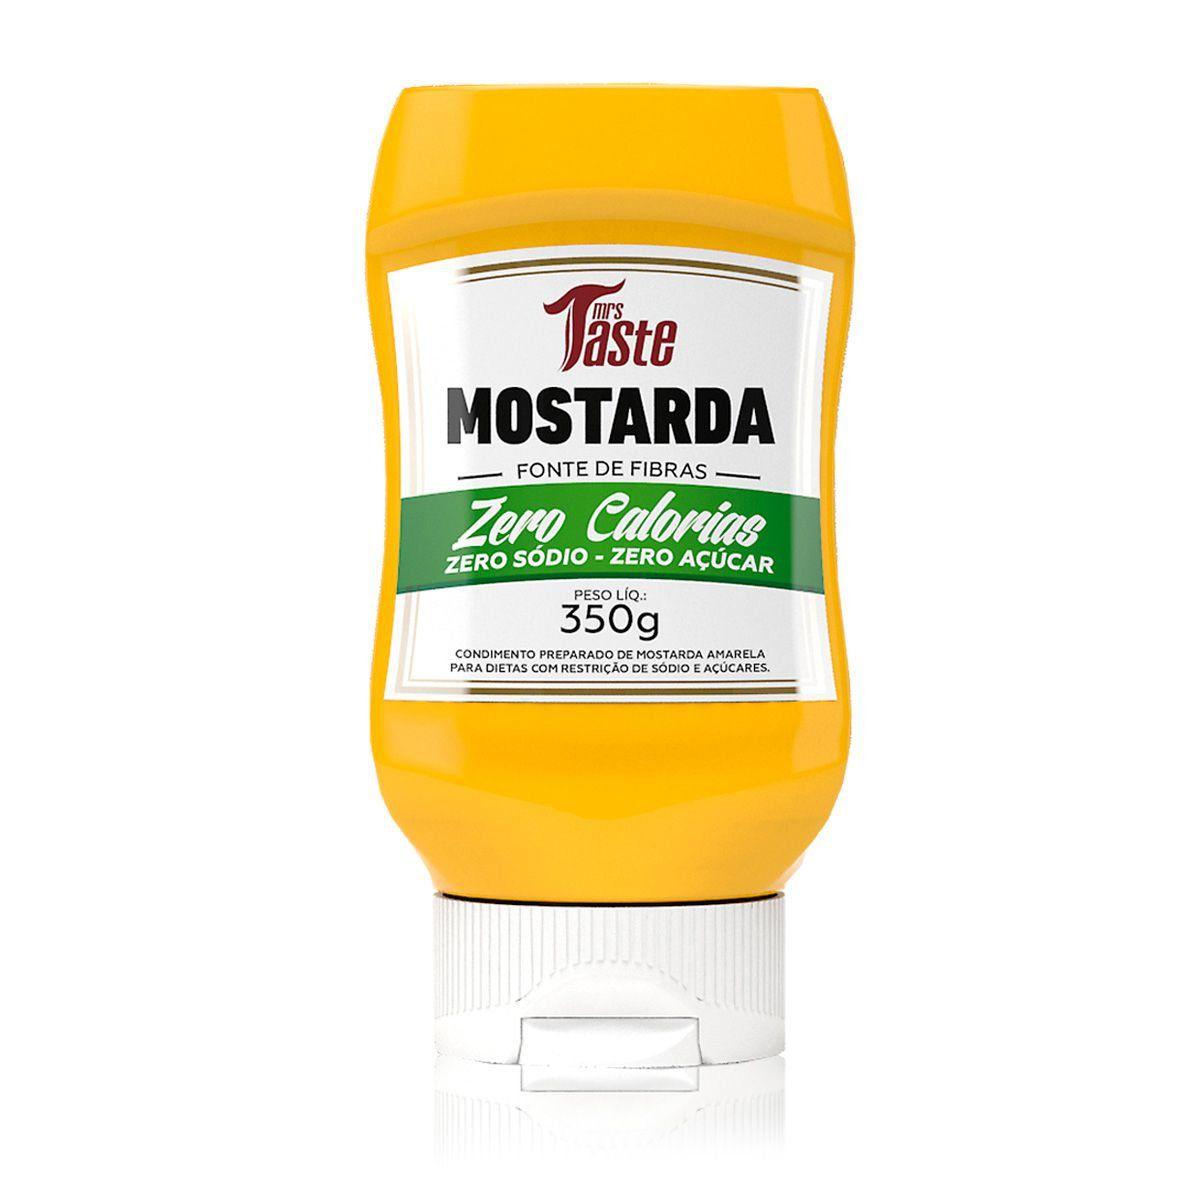 MOSTARDA MRS TASTE SF